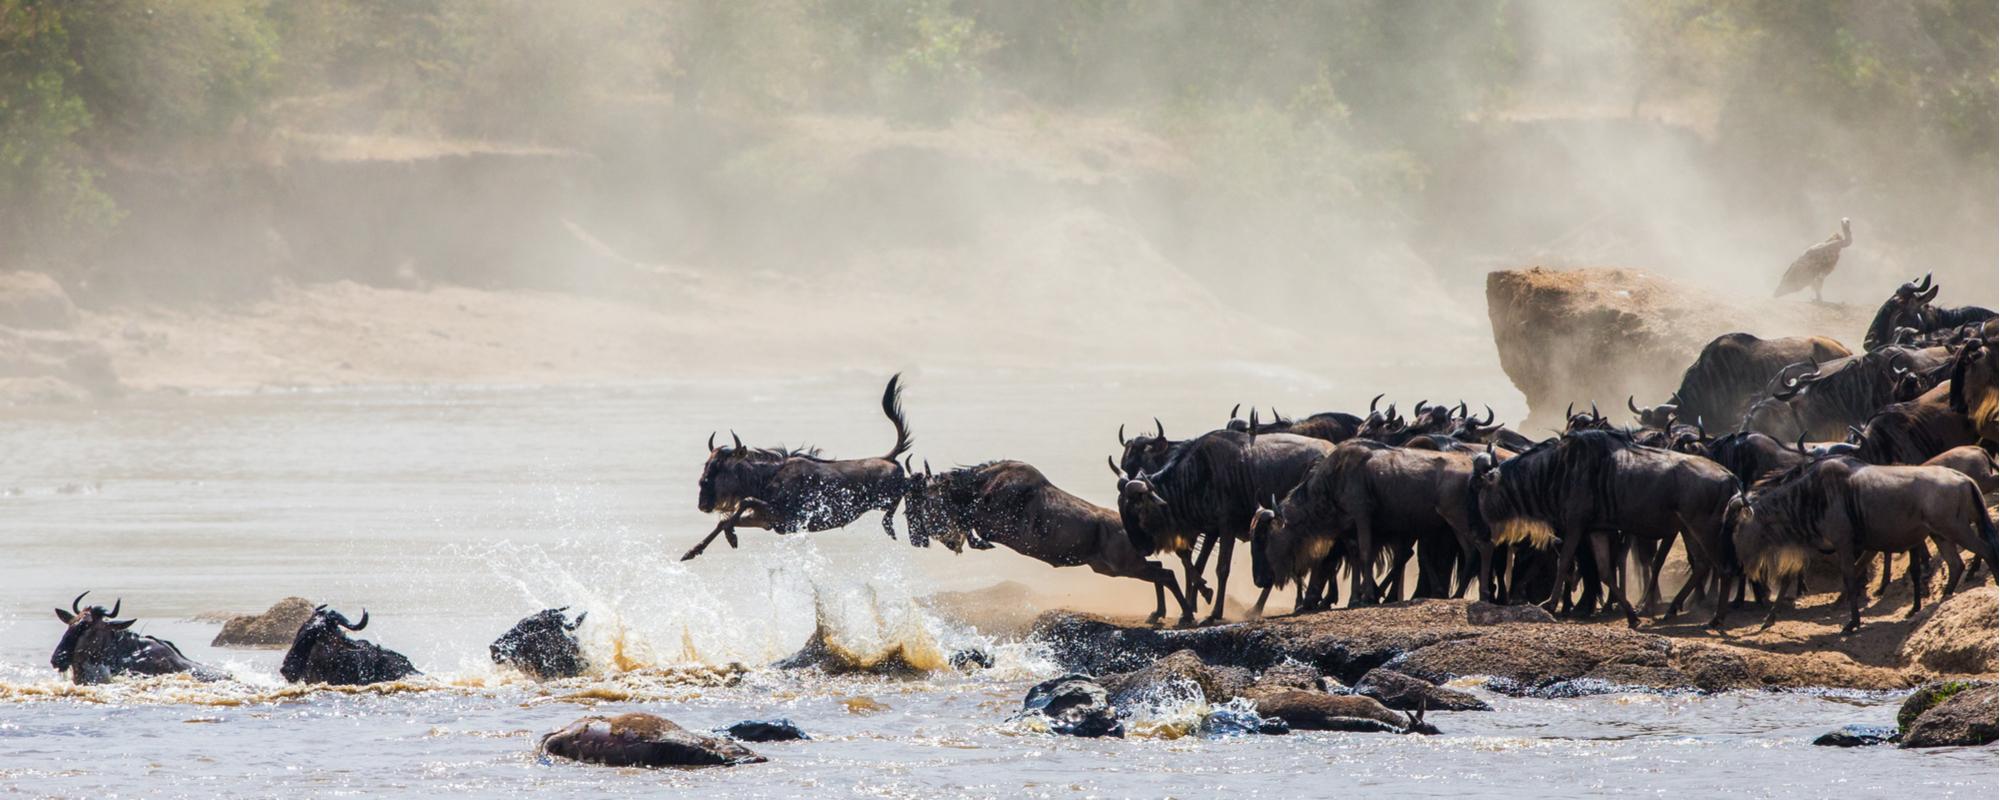 The Great Wildebeest Migration through the Serengeti and Ngorongoro National Parks